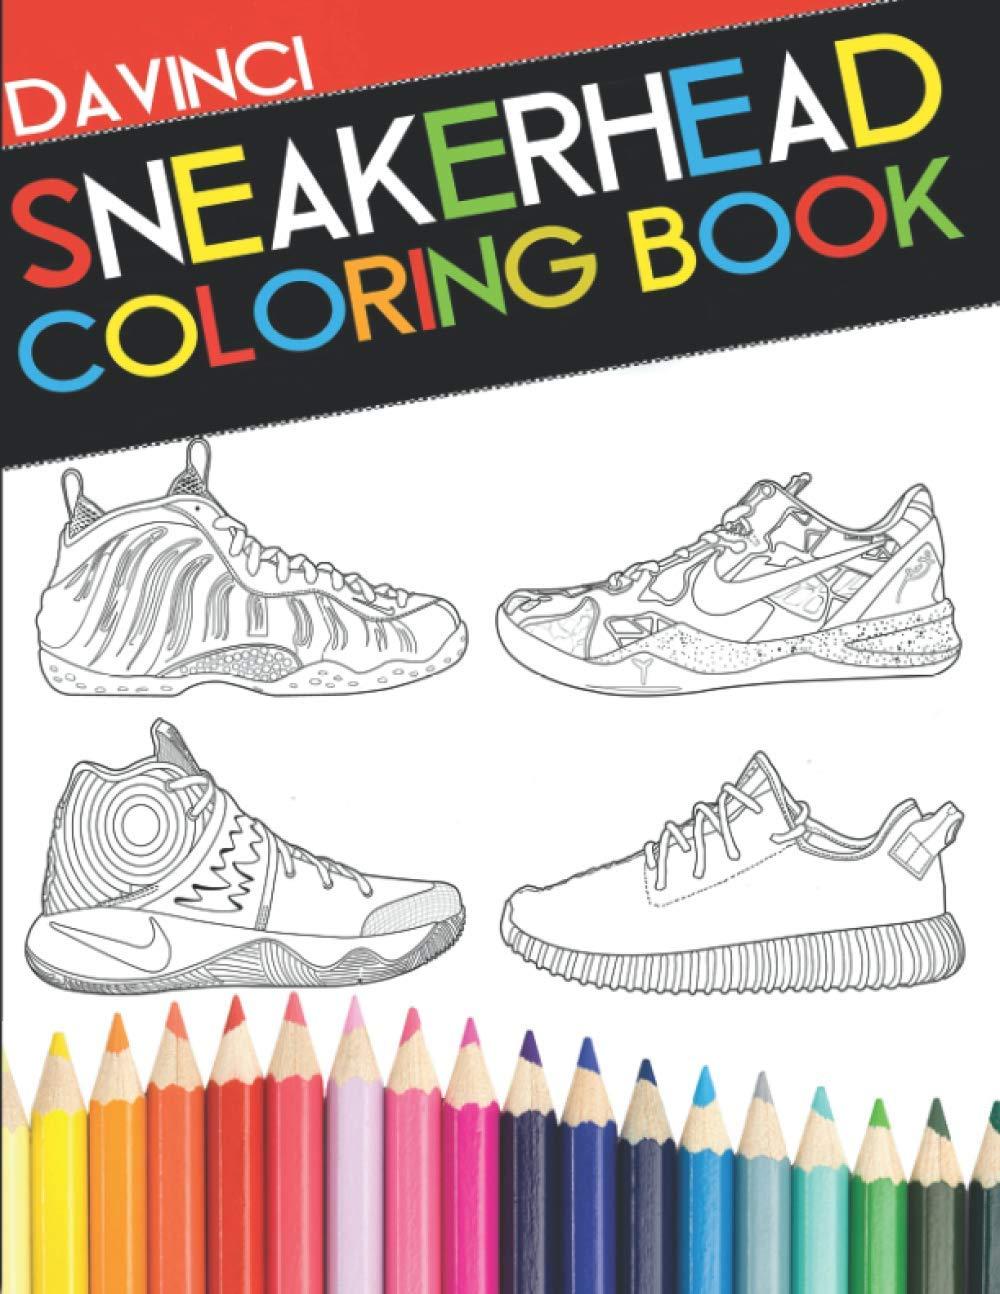 Sneakerhead Coloring Book Davinci Coloring Book Collection Davinci Davinci 9780692733189 Amazon Com Books